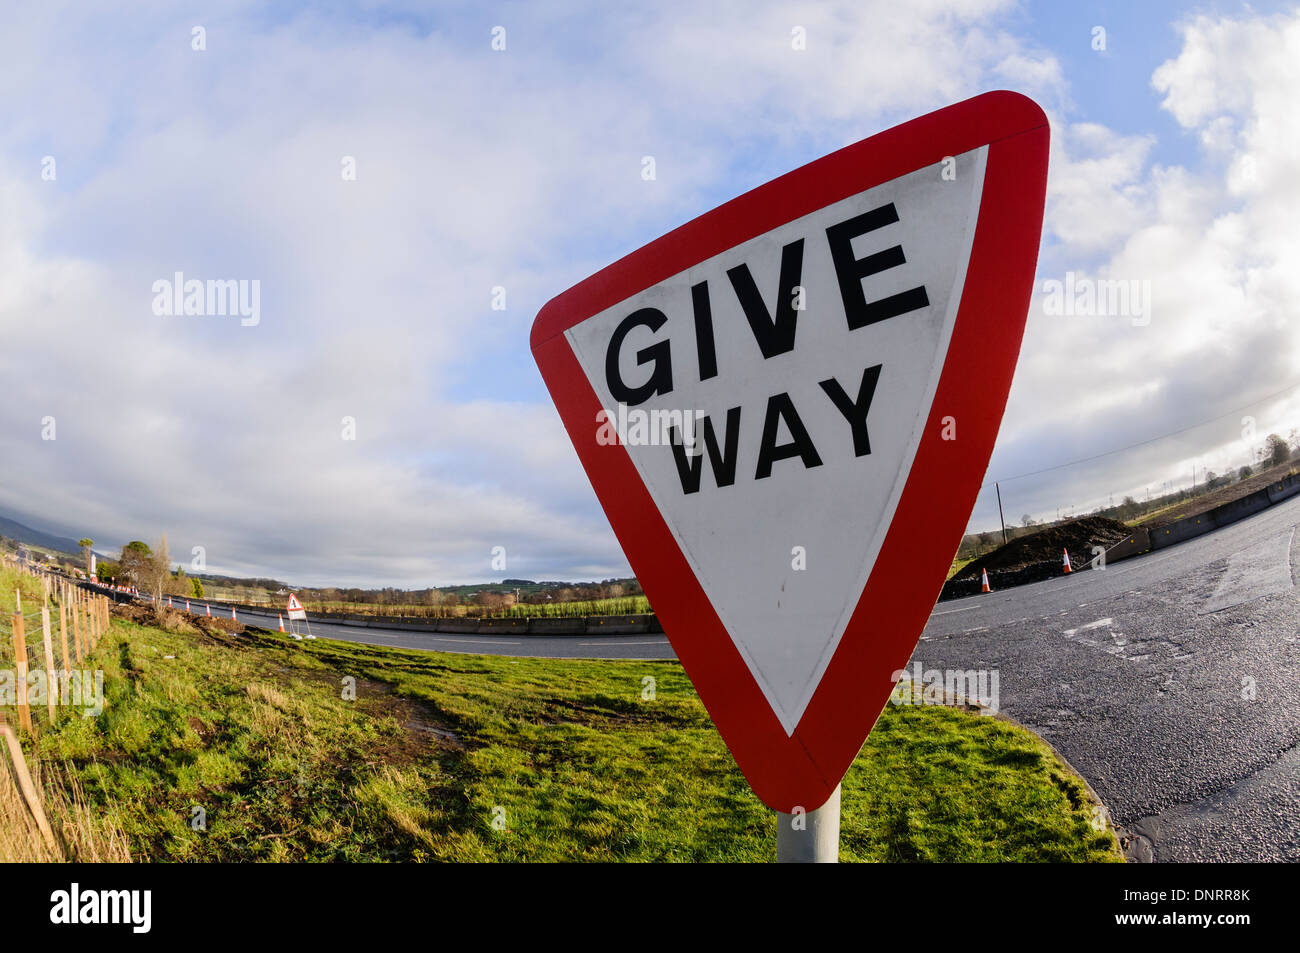 Give Way road sign - Stock Image